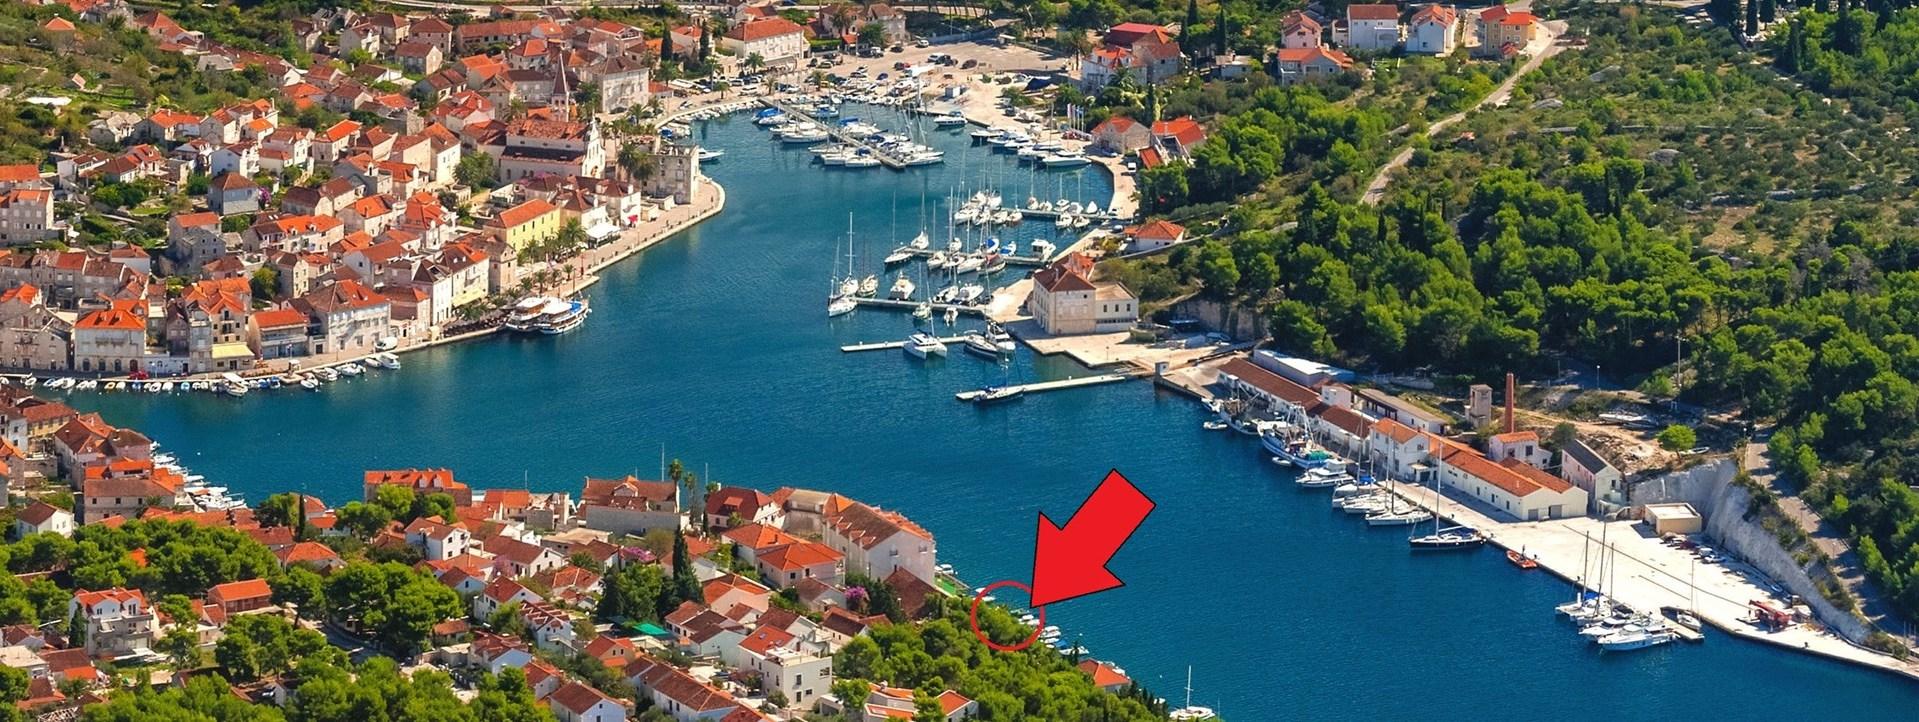 milna-inlet-brac-island-croatia